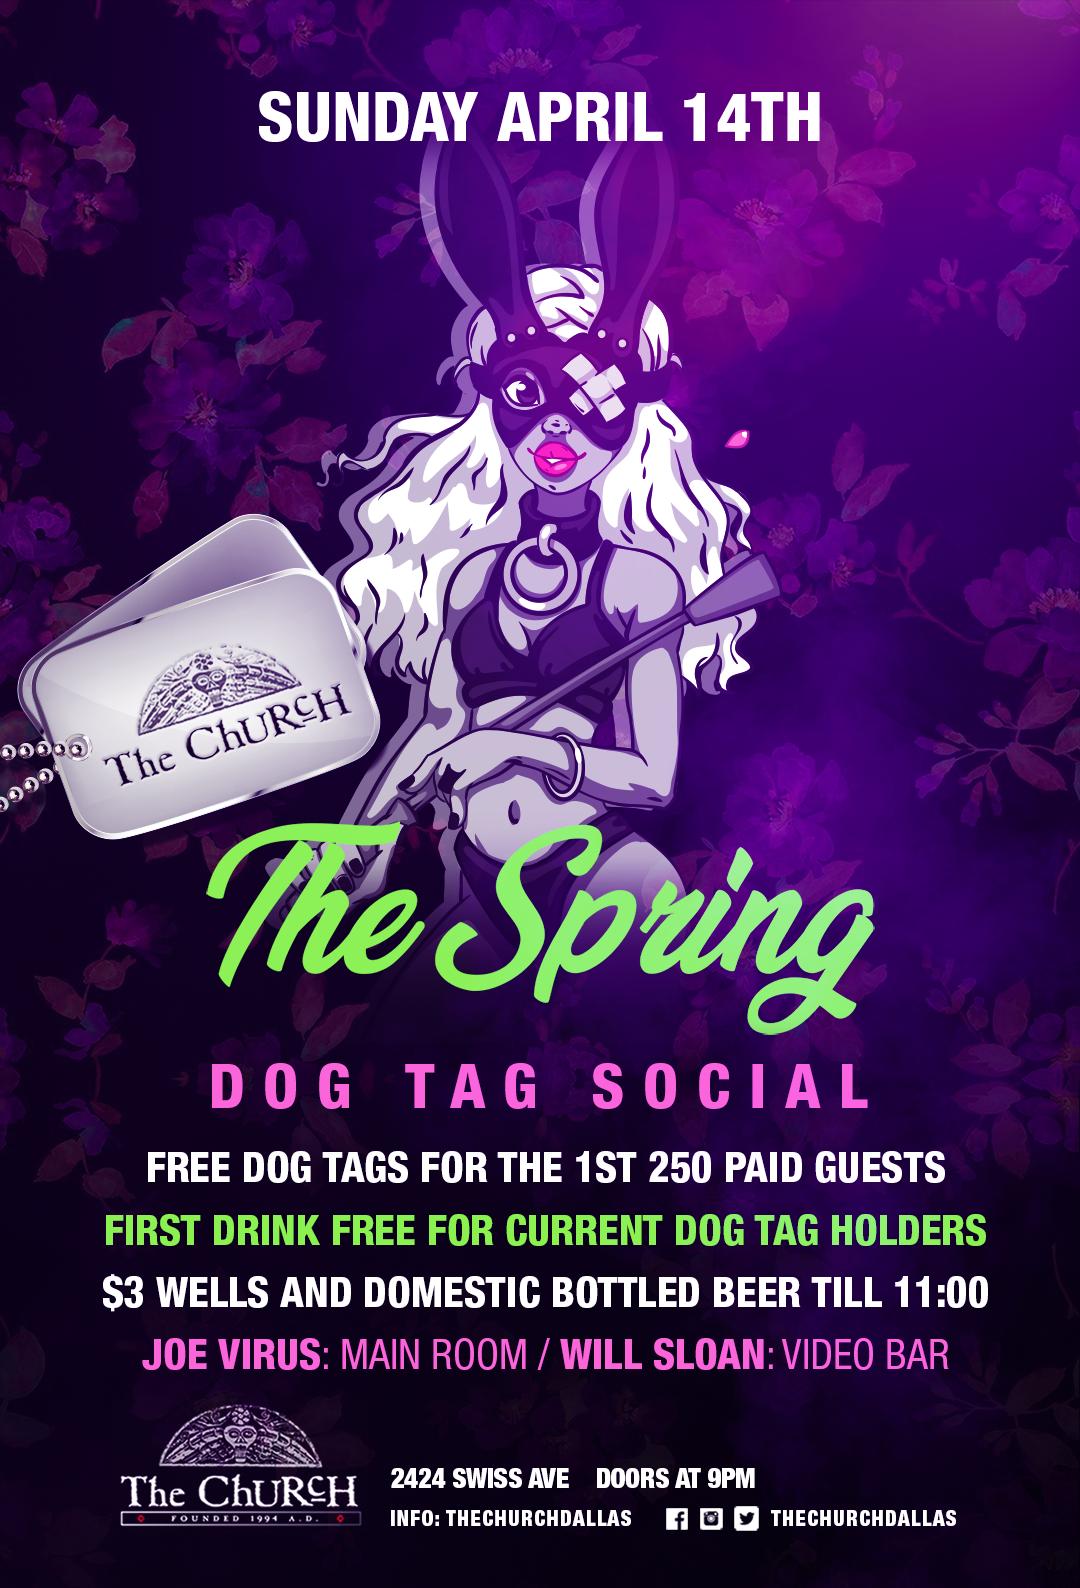 04.14.2019 - The Spring Dog Tag Social